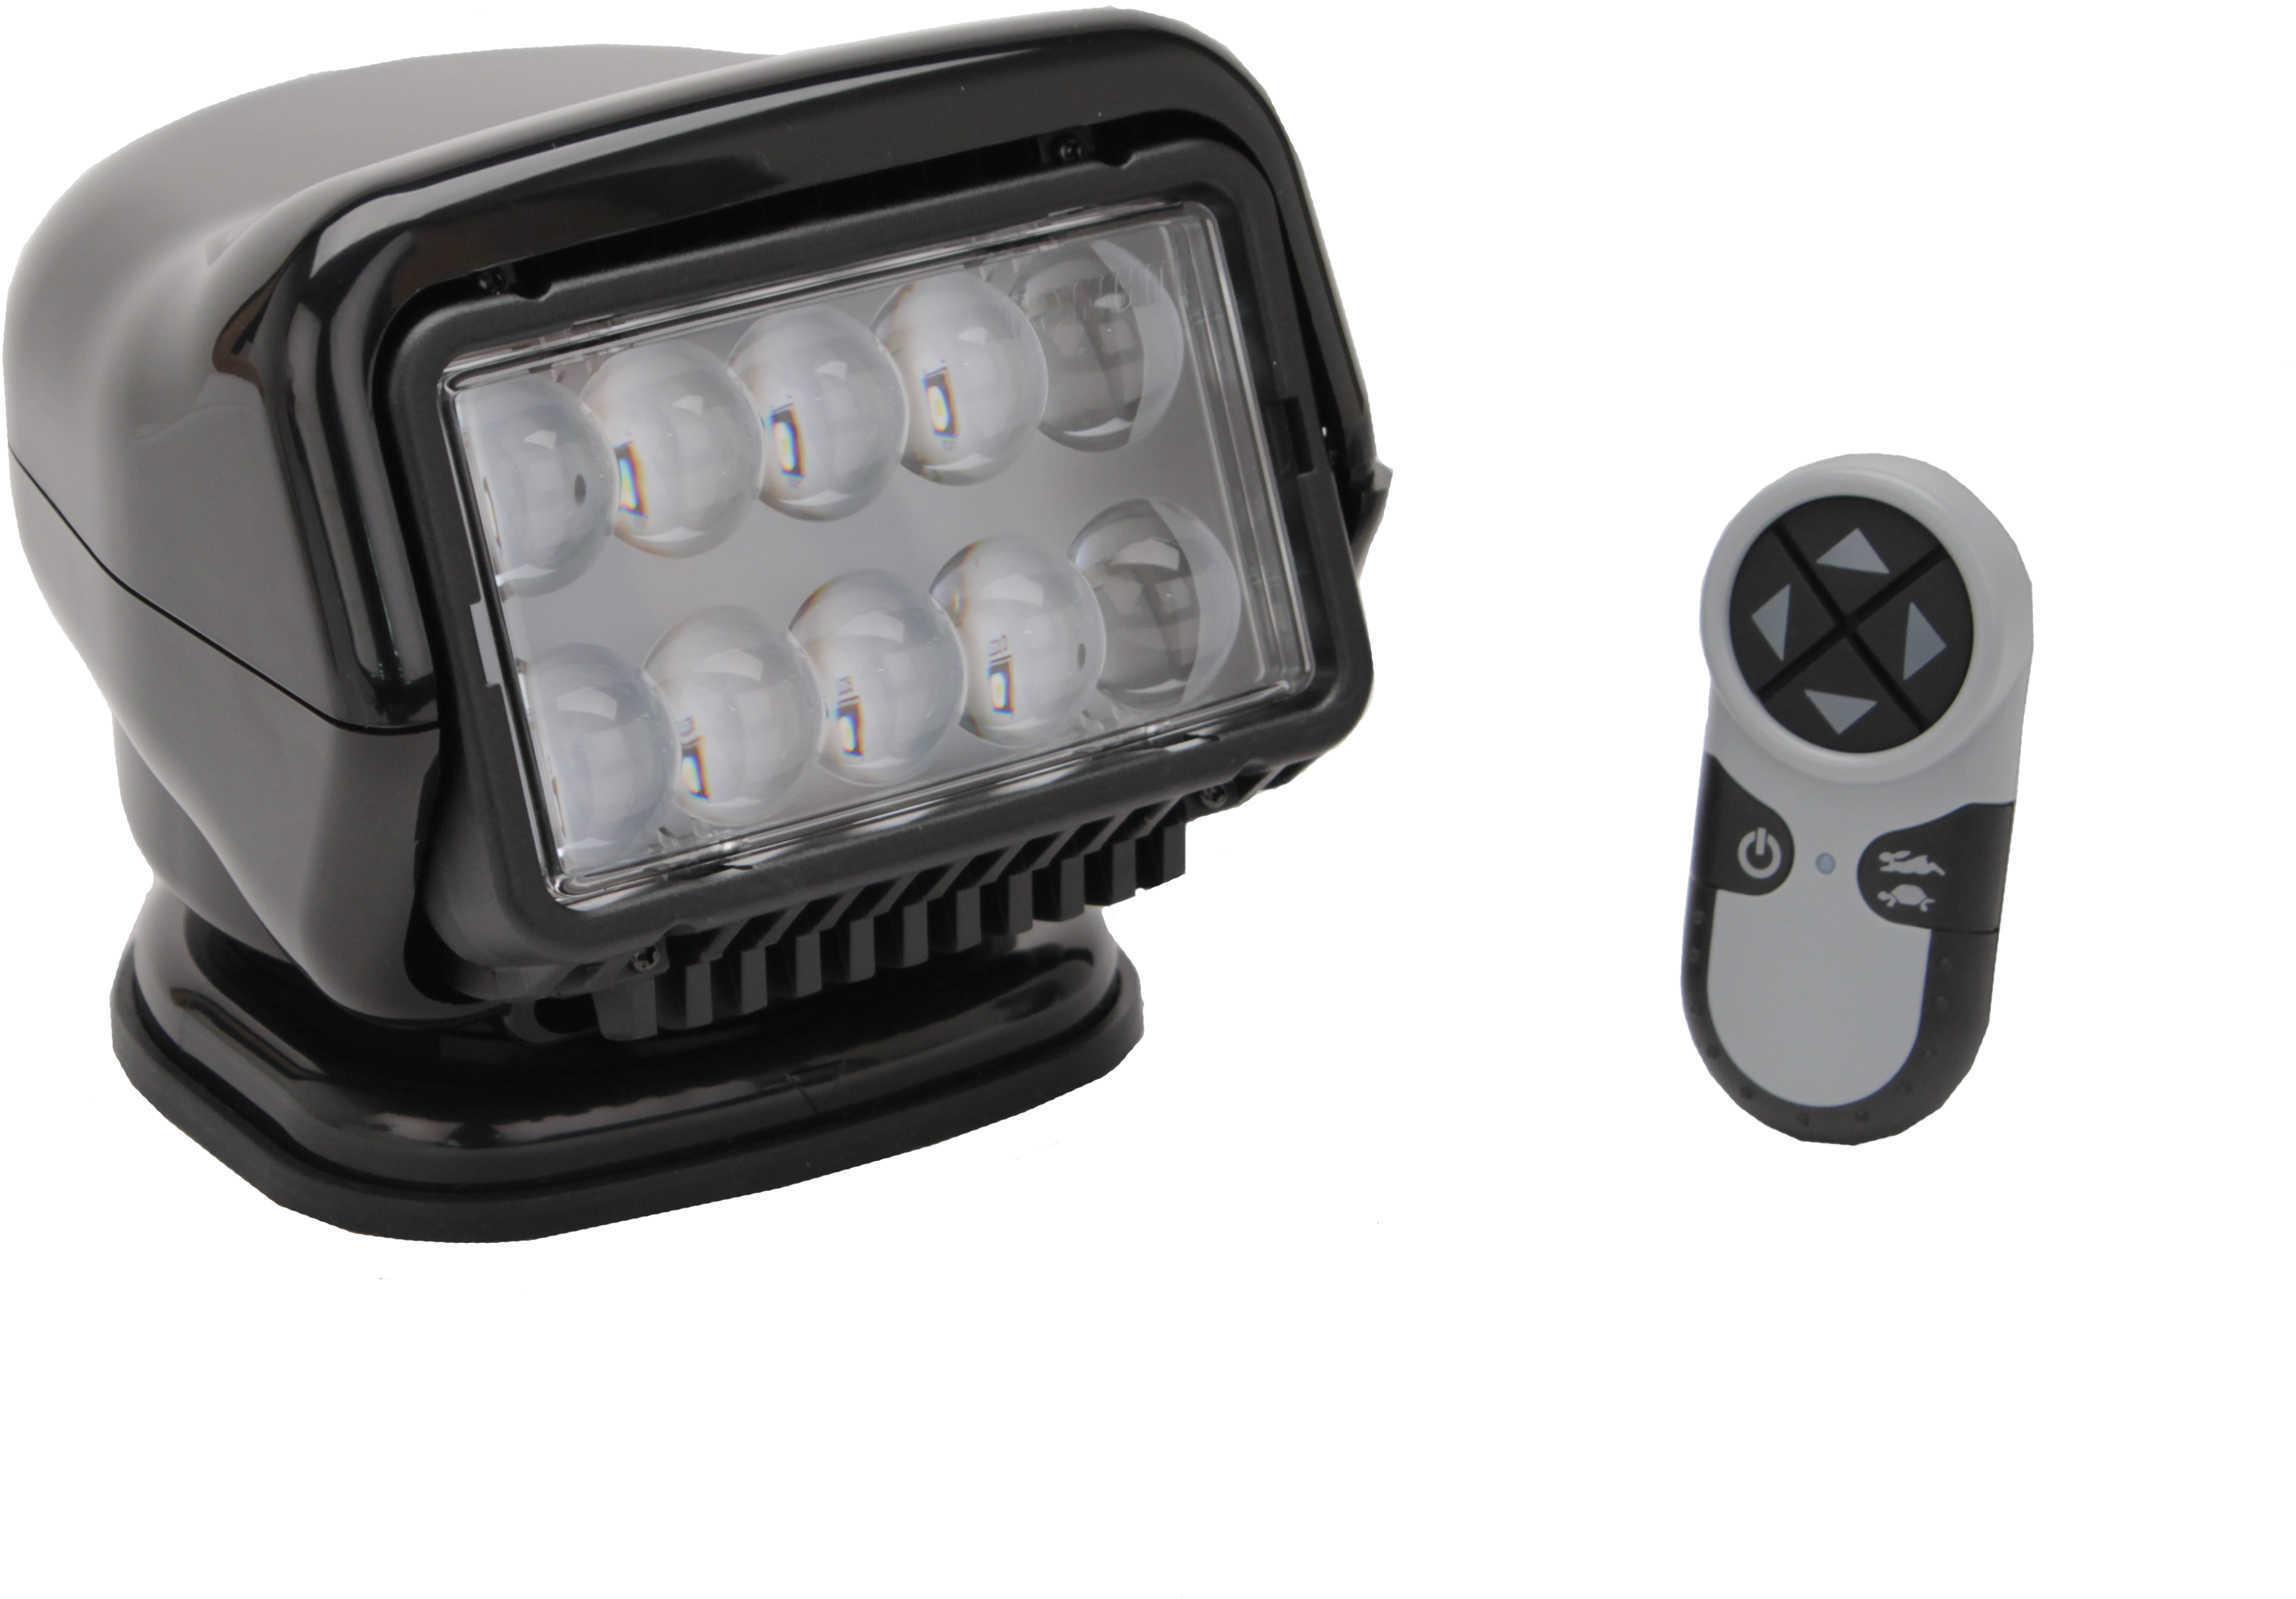 Led Stryker Wireless Handheld Remote Black Md: 30514